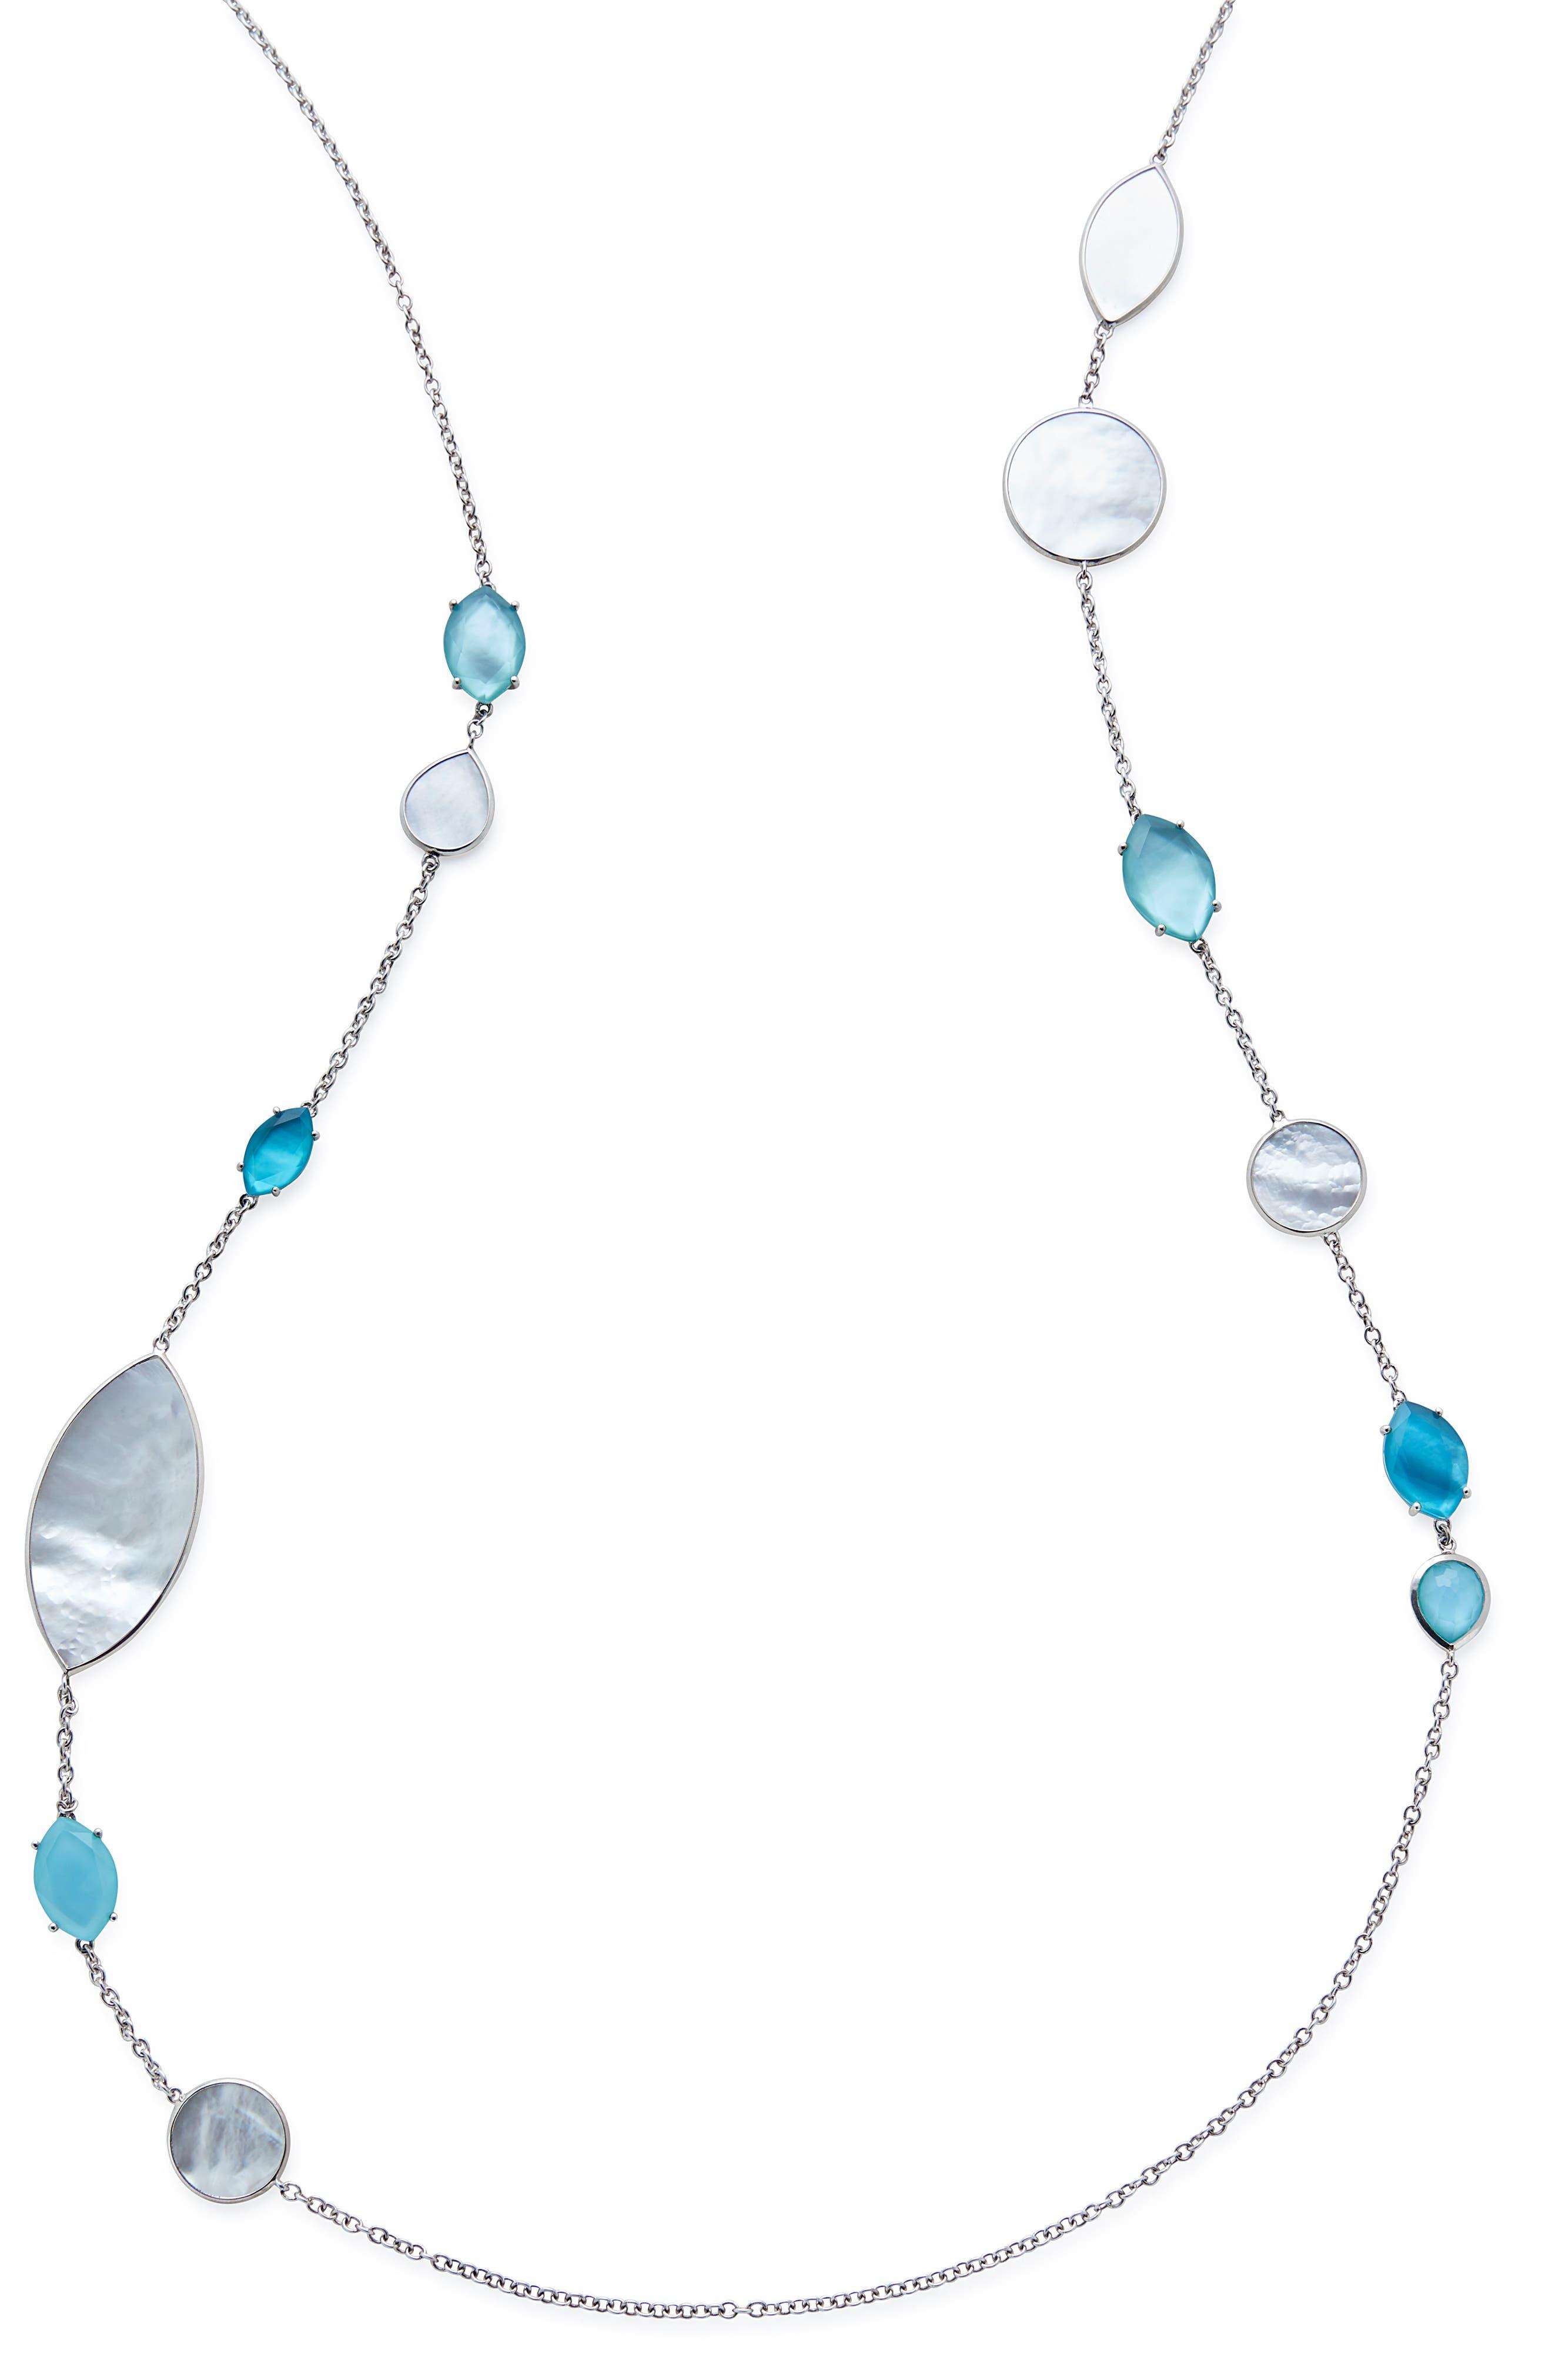 Wonderland Long Marquise Stone Necklace,                             Alternate thumbnail 2, color,                             BLUE/ MOP